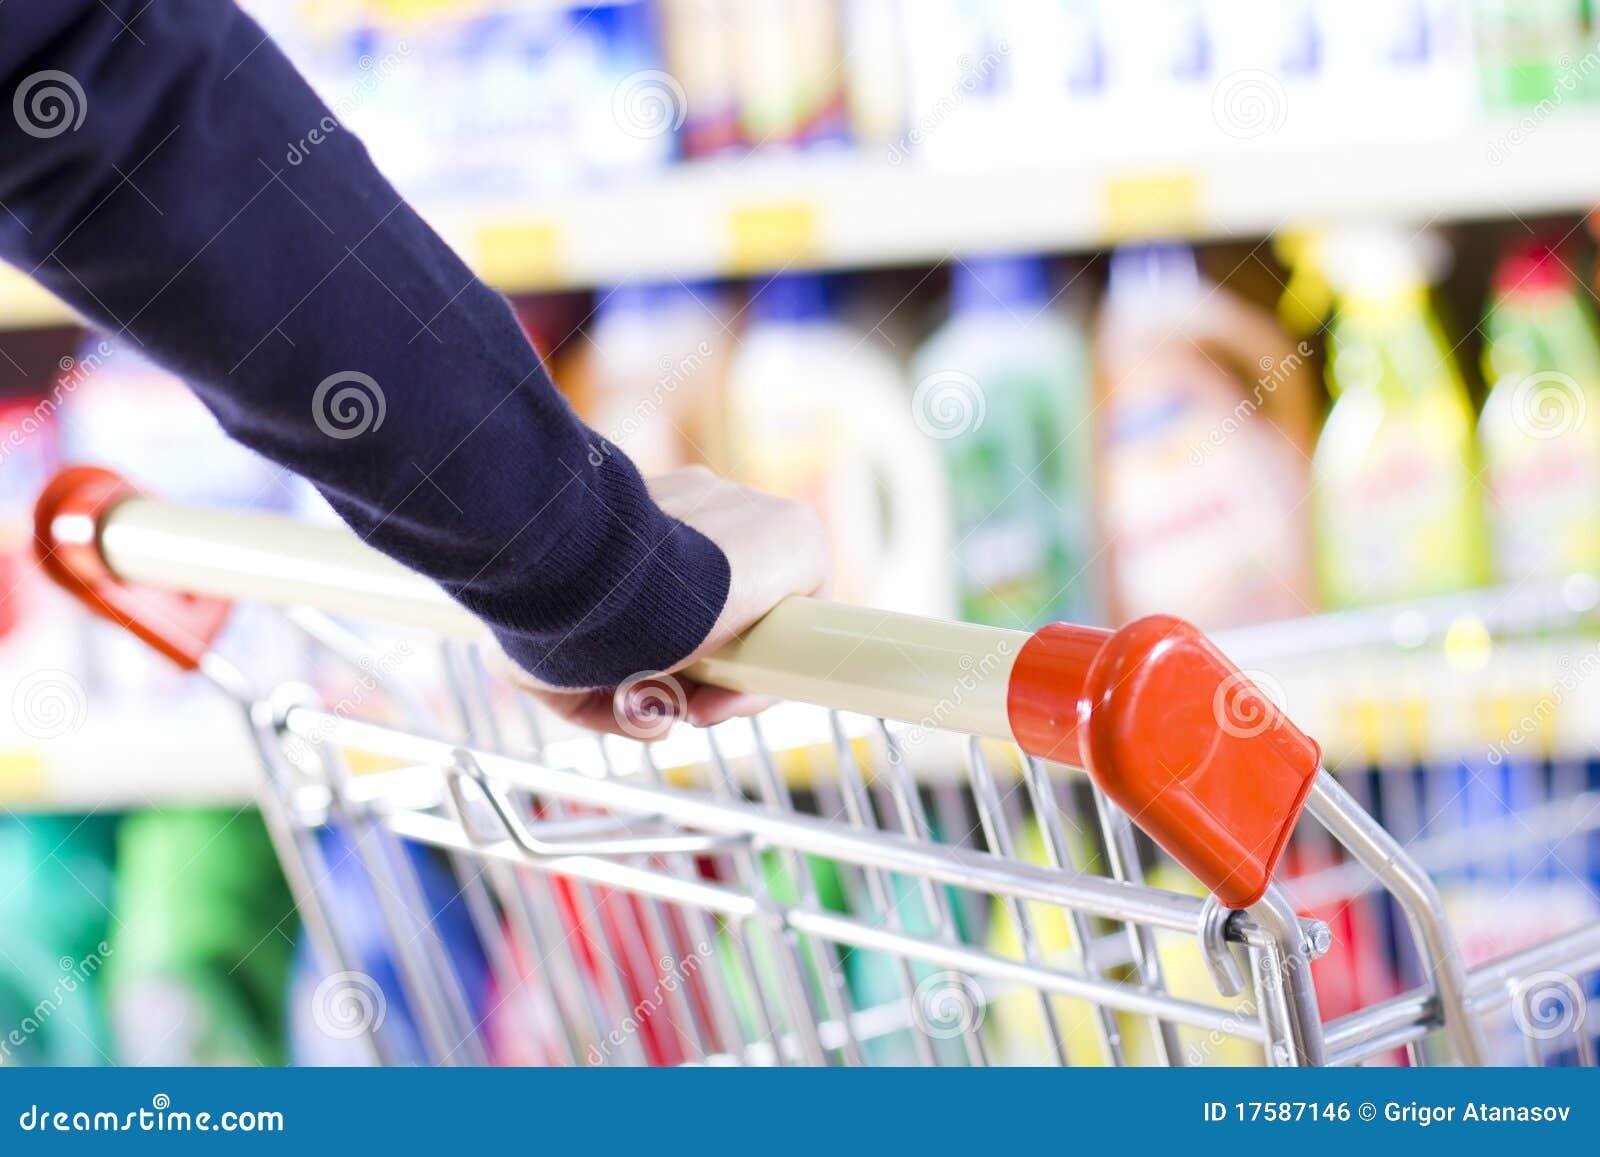 Customer pushing shopping cart